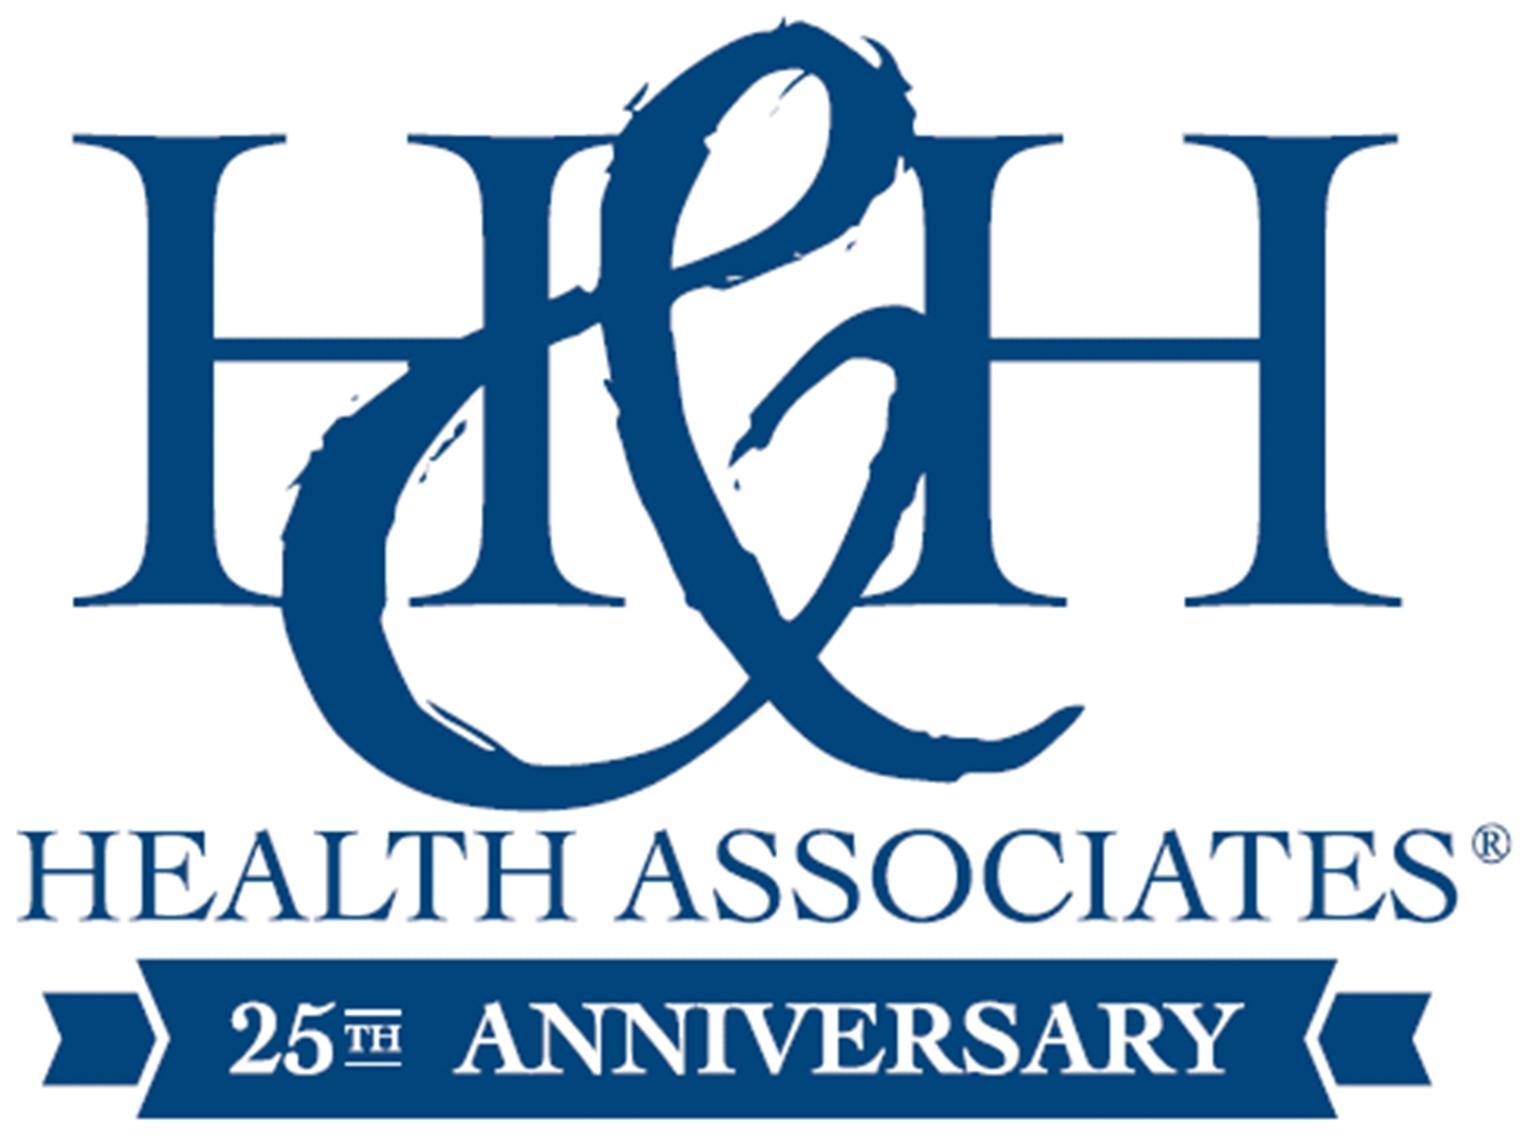 HH Health Associates 25 Anniversary